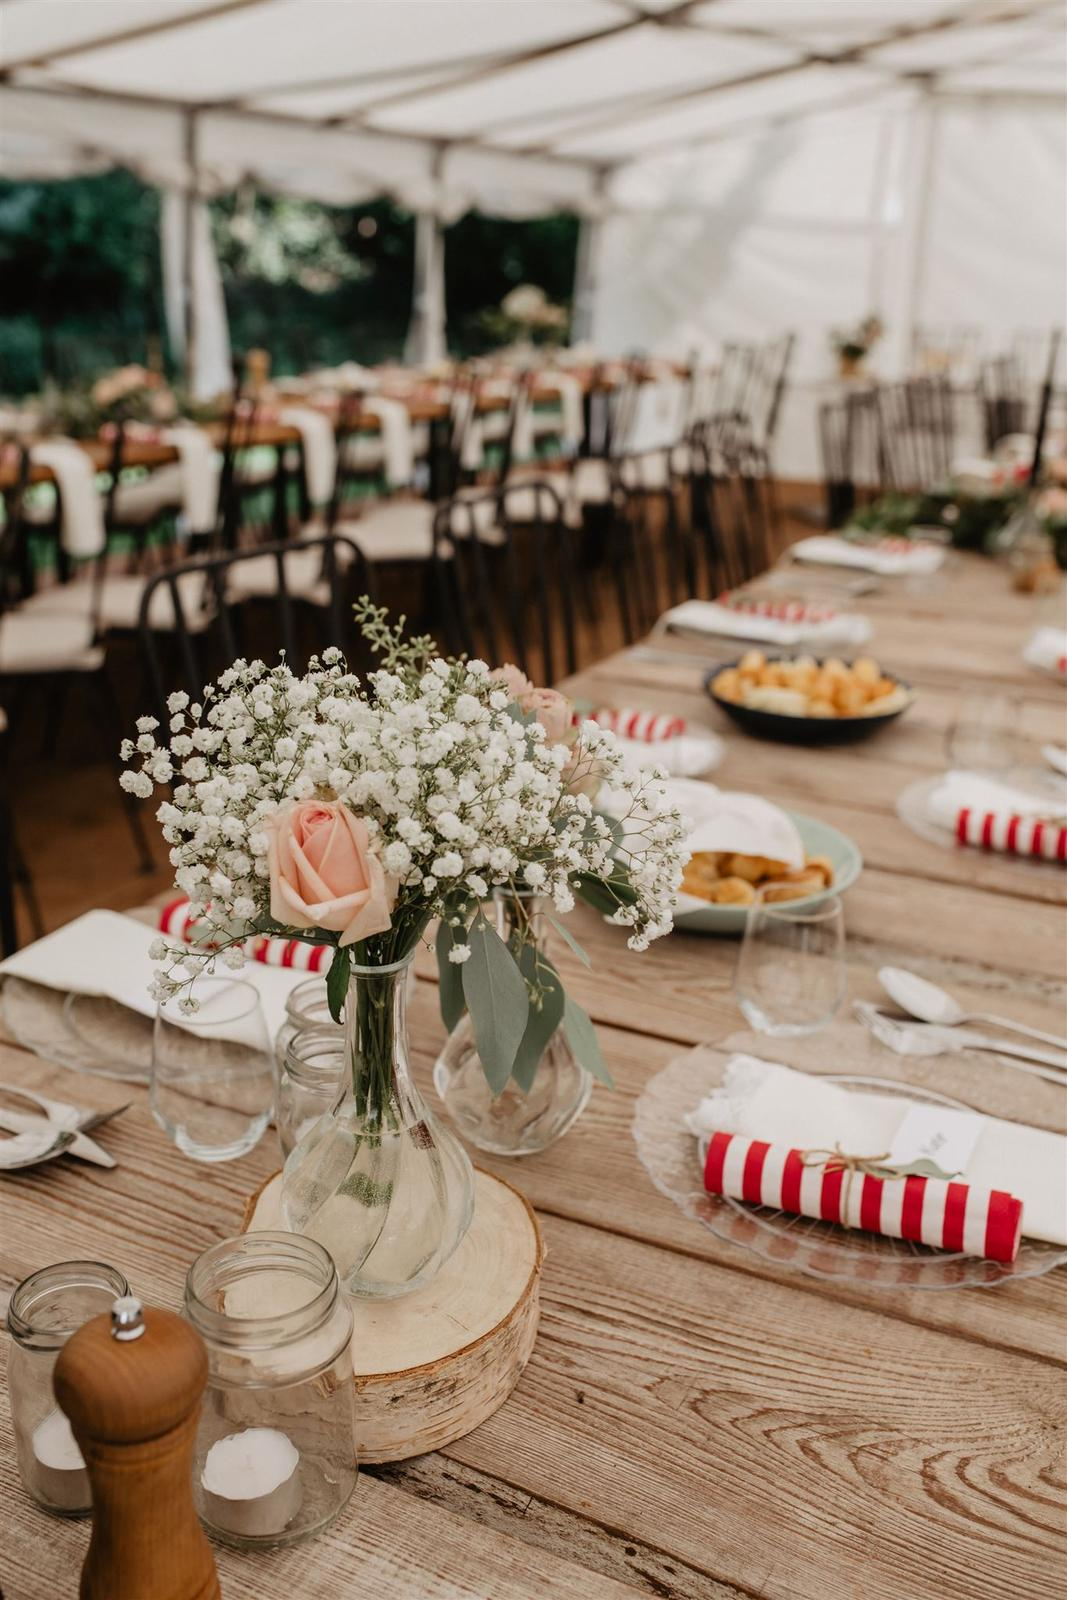 Krásna a romantická svadobná party v záhrade reštaurácie Bistra Dukát - Le Gout v srdci B. Bystrice. - Obrázok č. 3